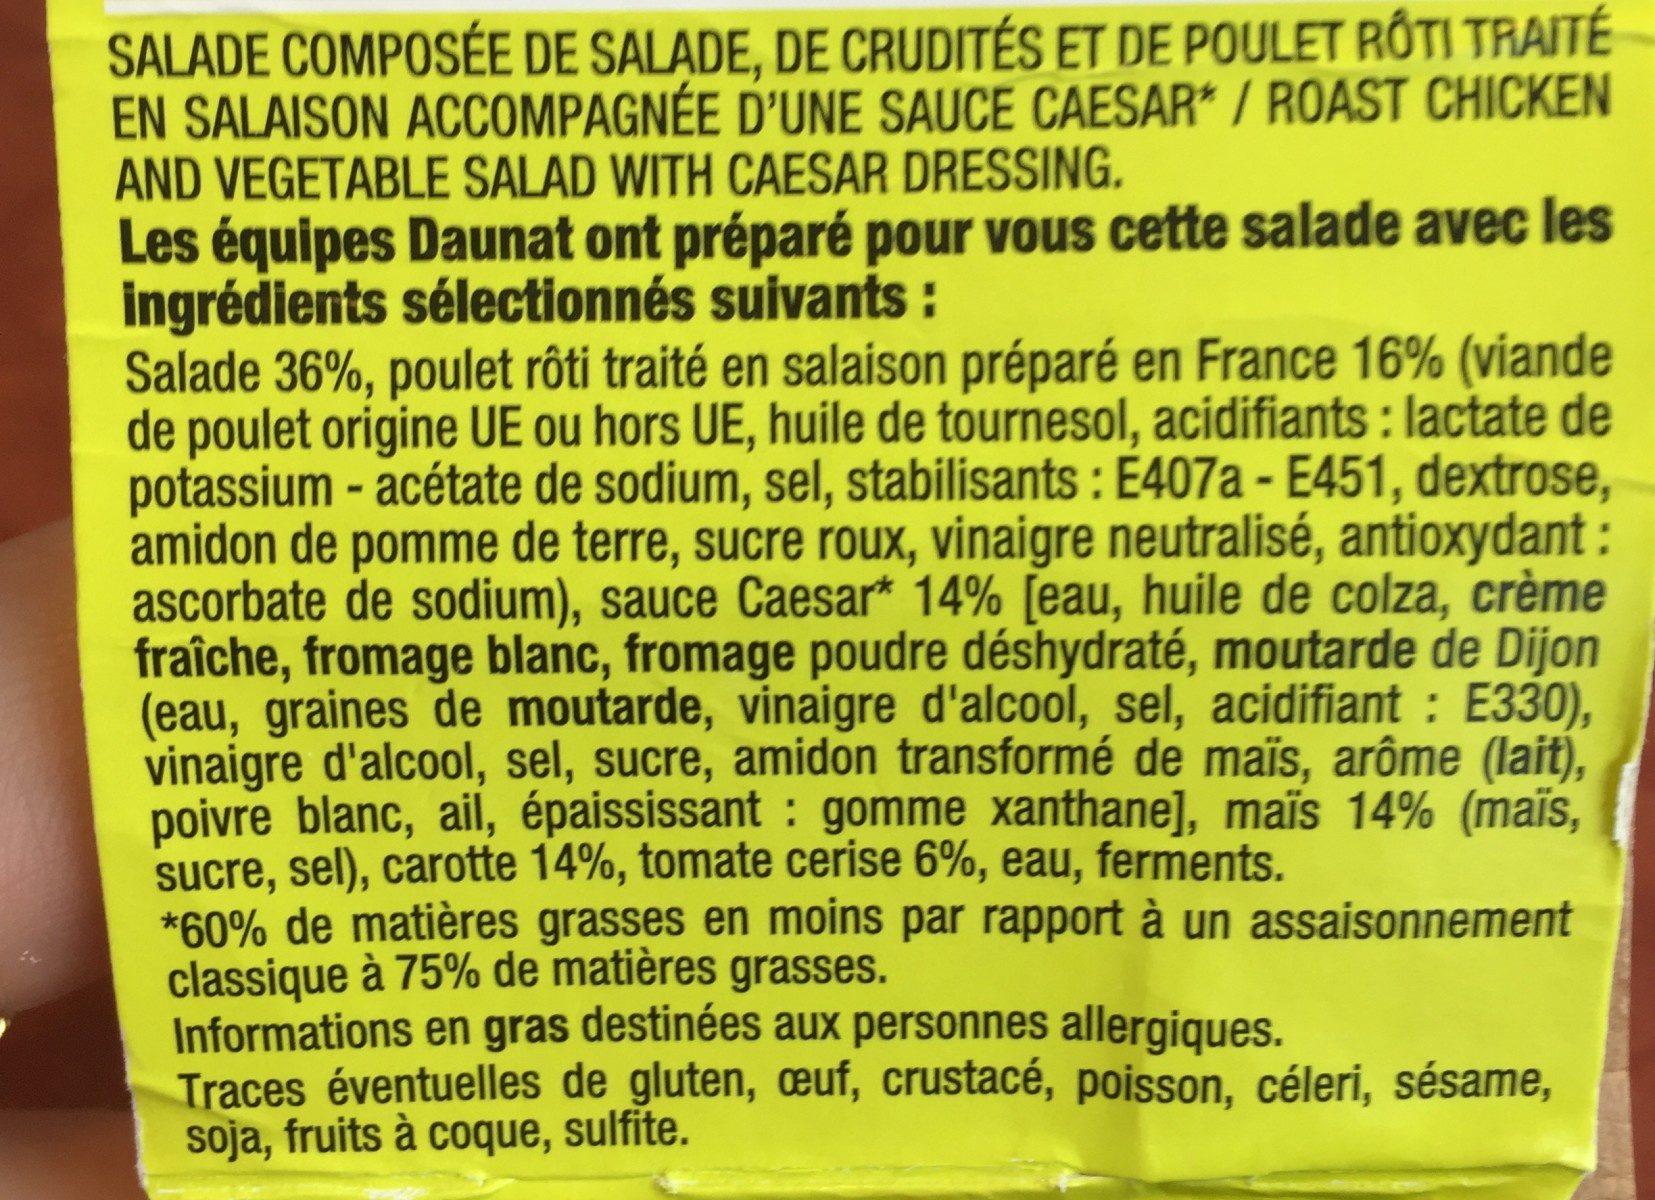 La Caesar poulet roti, salade et crudites - Ingrédients - fr